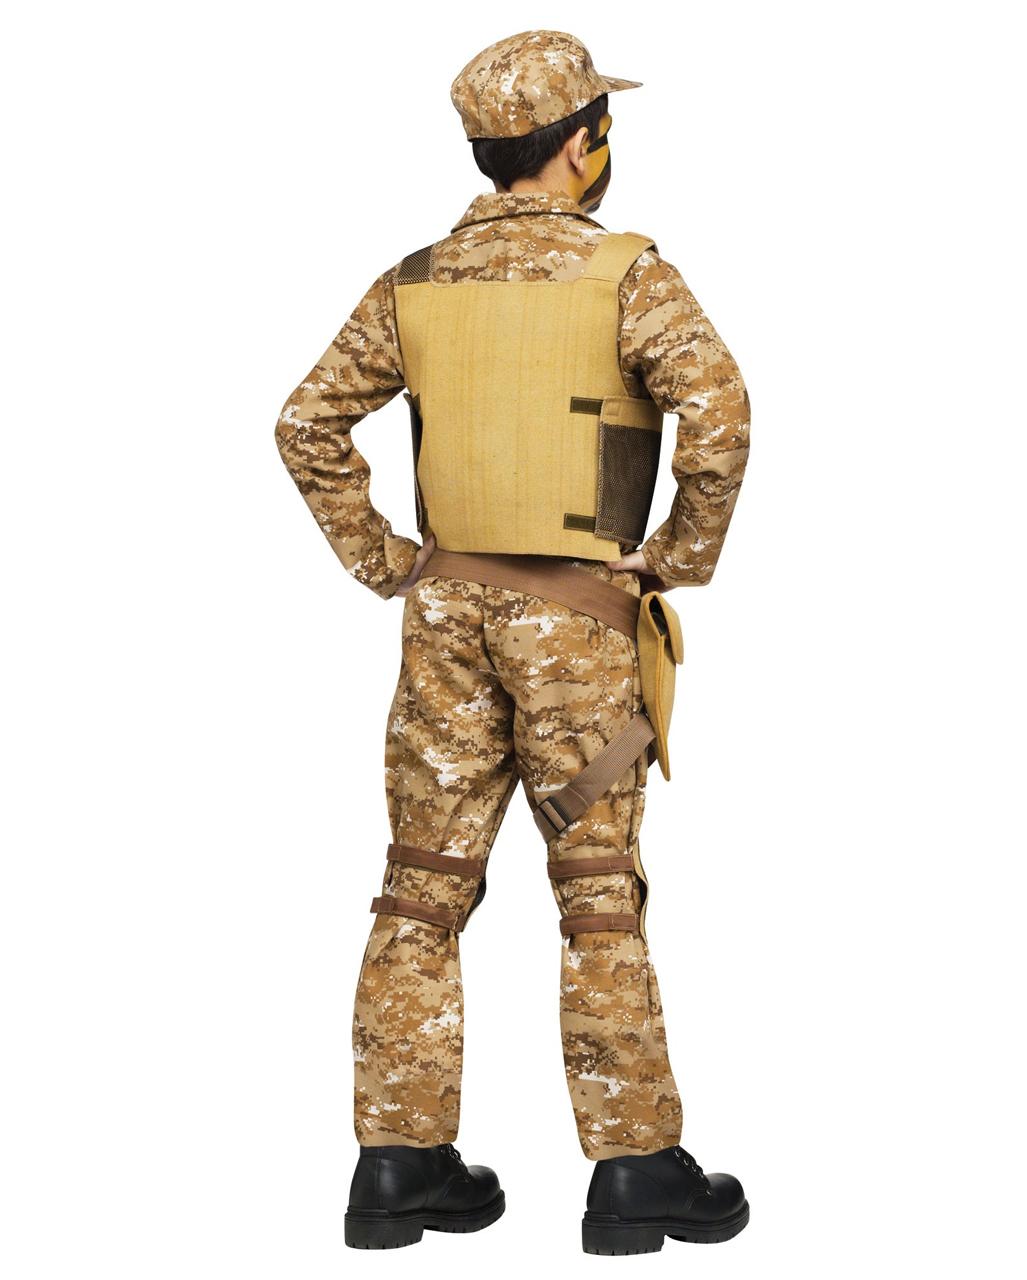 Navy Seal Kids Costume Navy Seal Kids Costume  sc 1 st  Horror-Shop.com & Navy Seal Kids Costume | Military costume for children | horror-shop.com